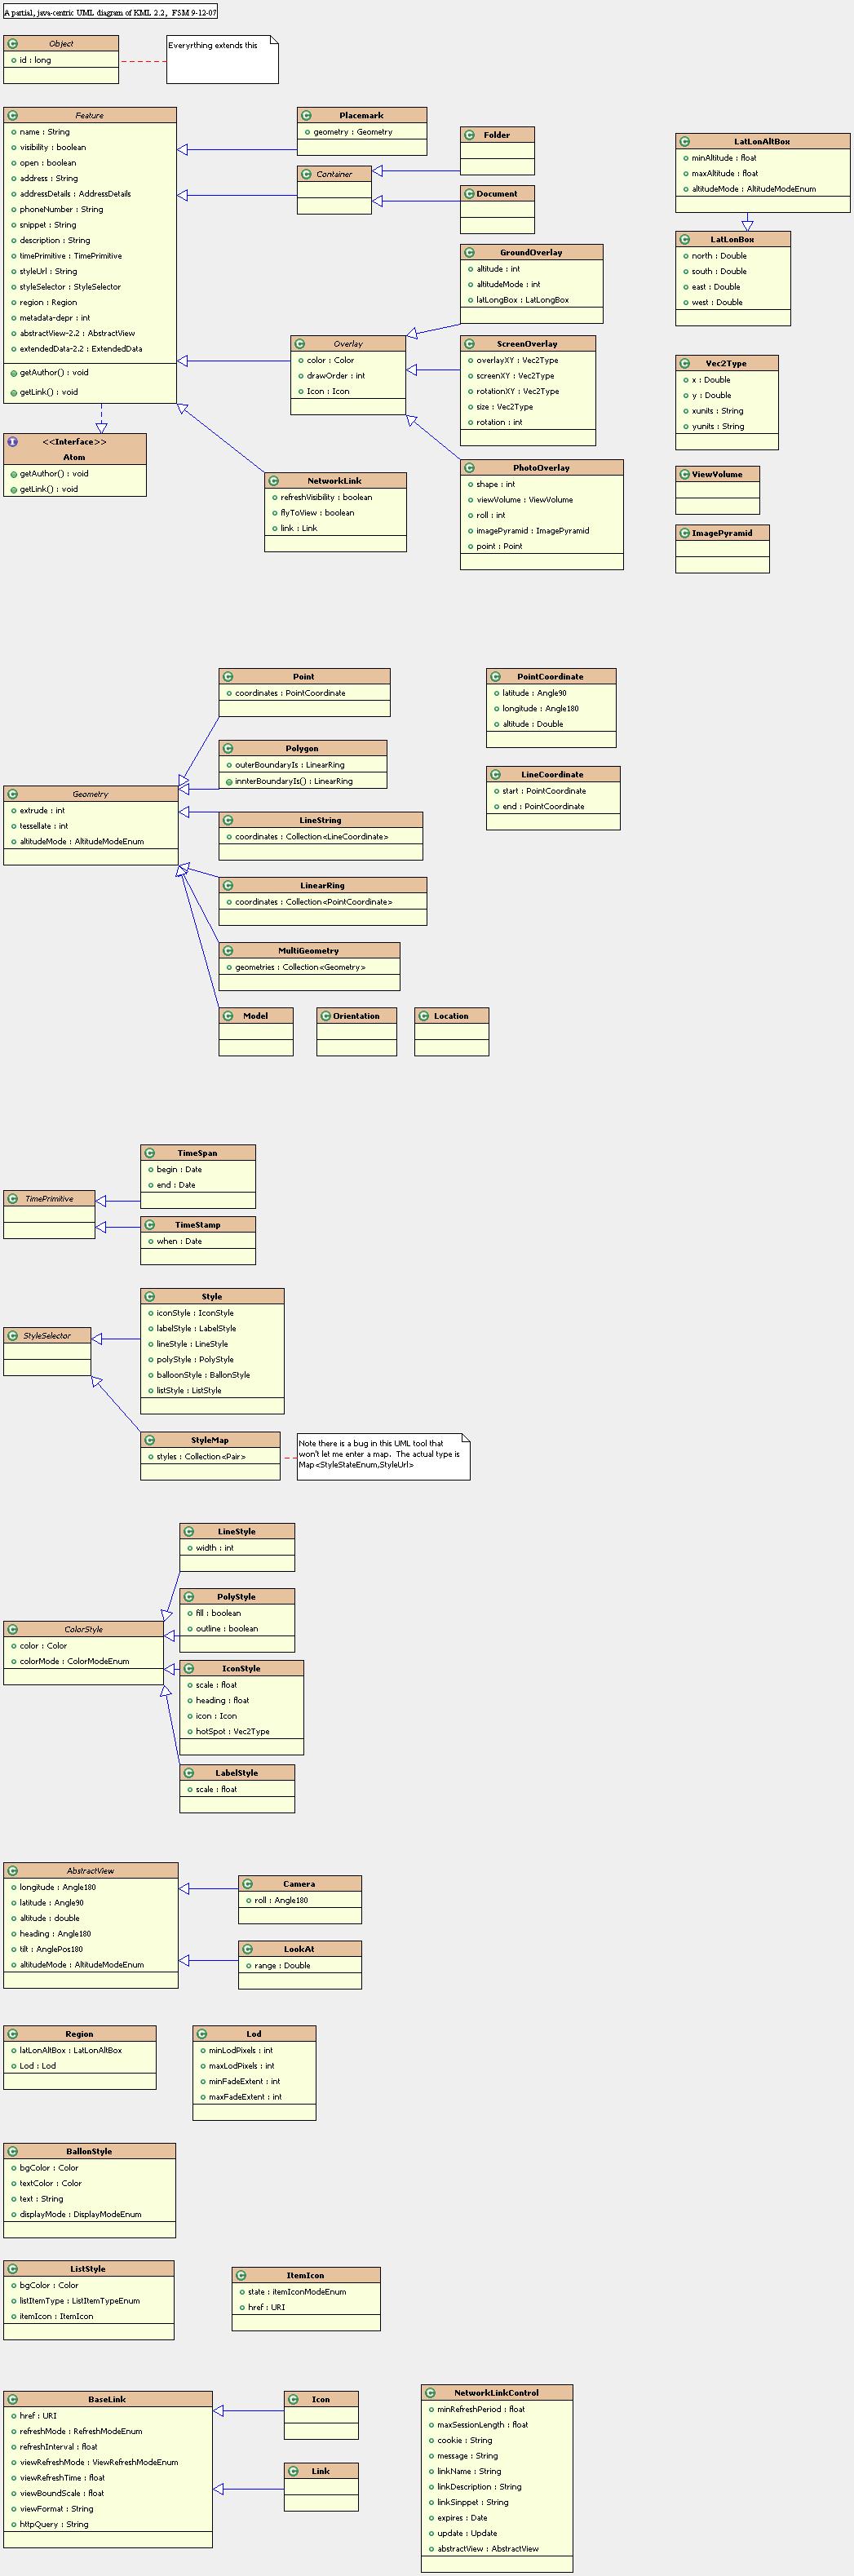 uml diagrams learn programming, computer programming, class diagram,  database design, use case